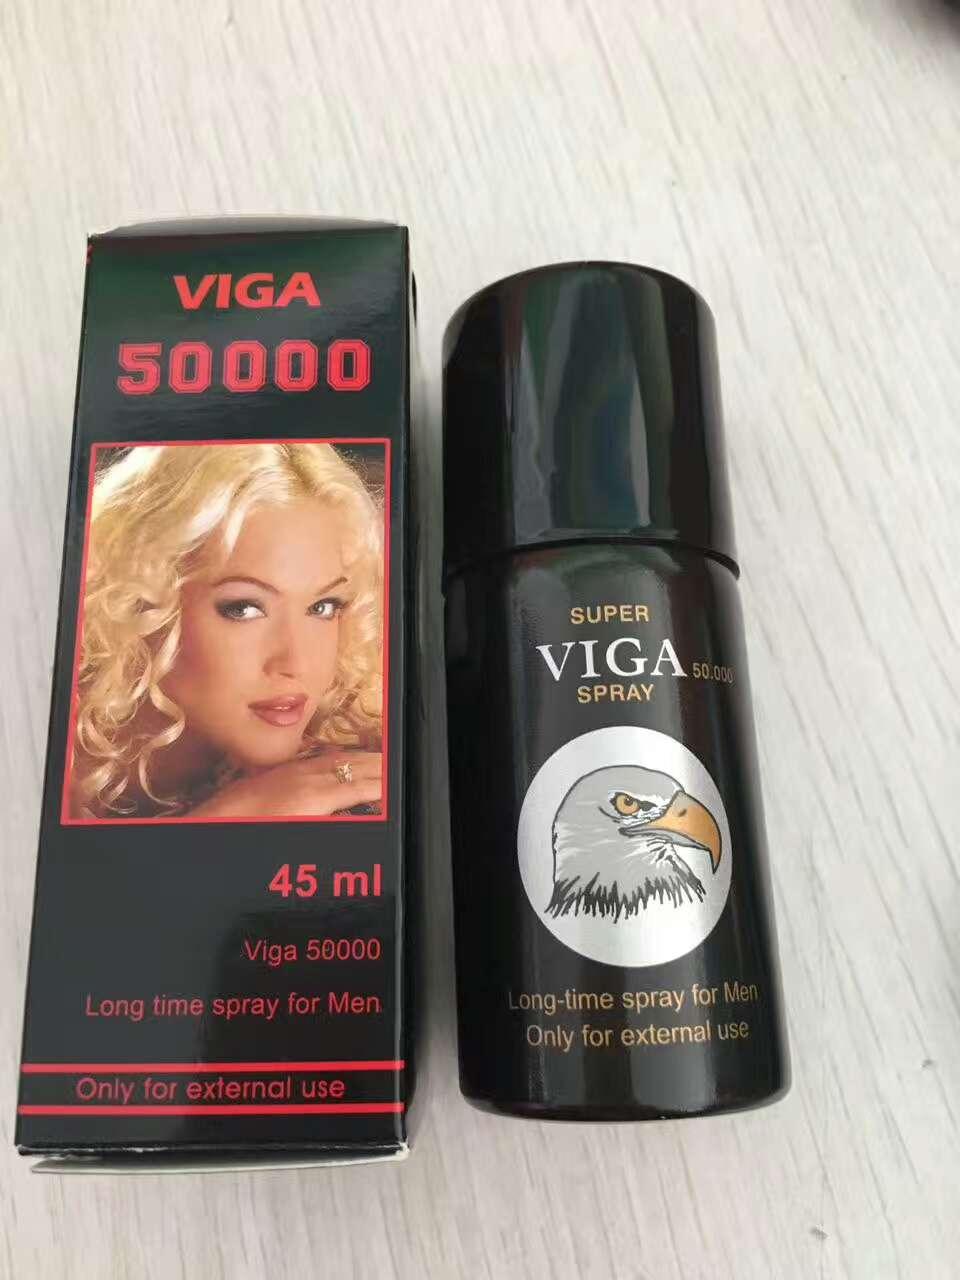 long time spray for men super Viga 5000